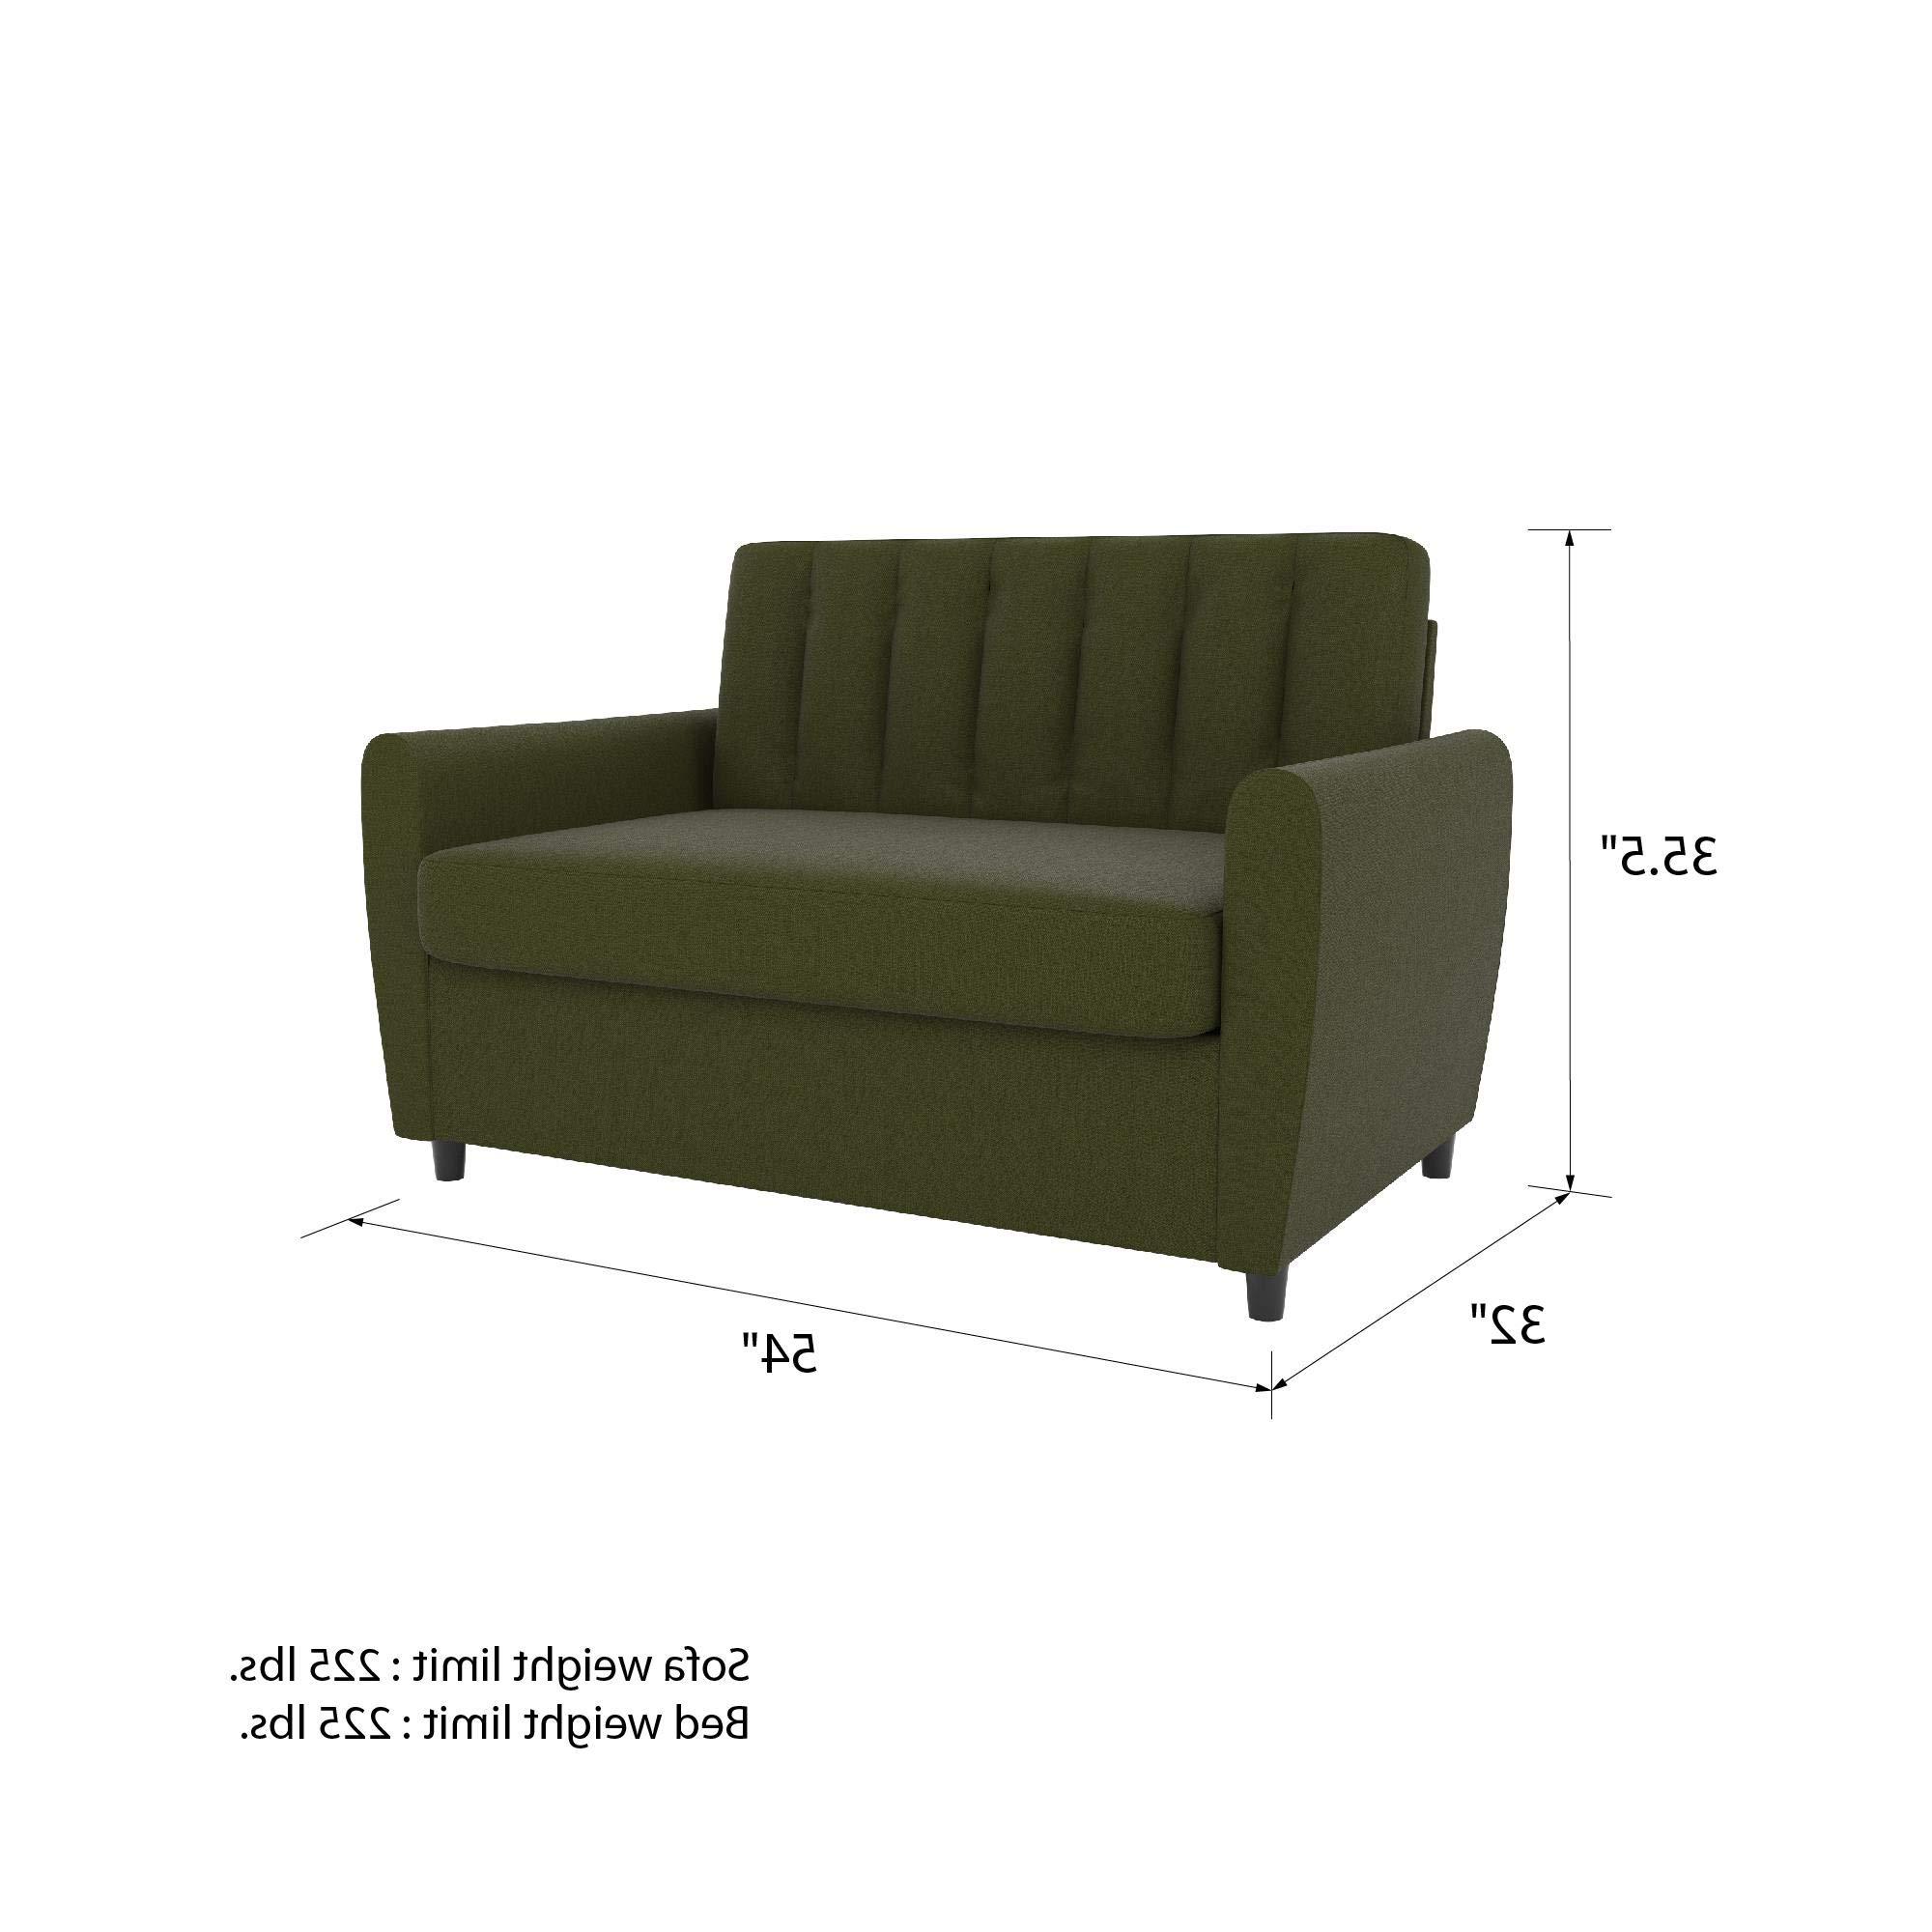 Trendy Novogratz Brittany Sofa Futon – Navy Linen – Active Furniture In Brittany Sectional Futon Sofas (View 18 of 25)